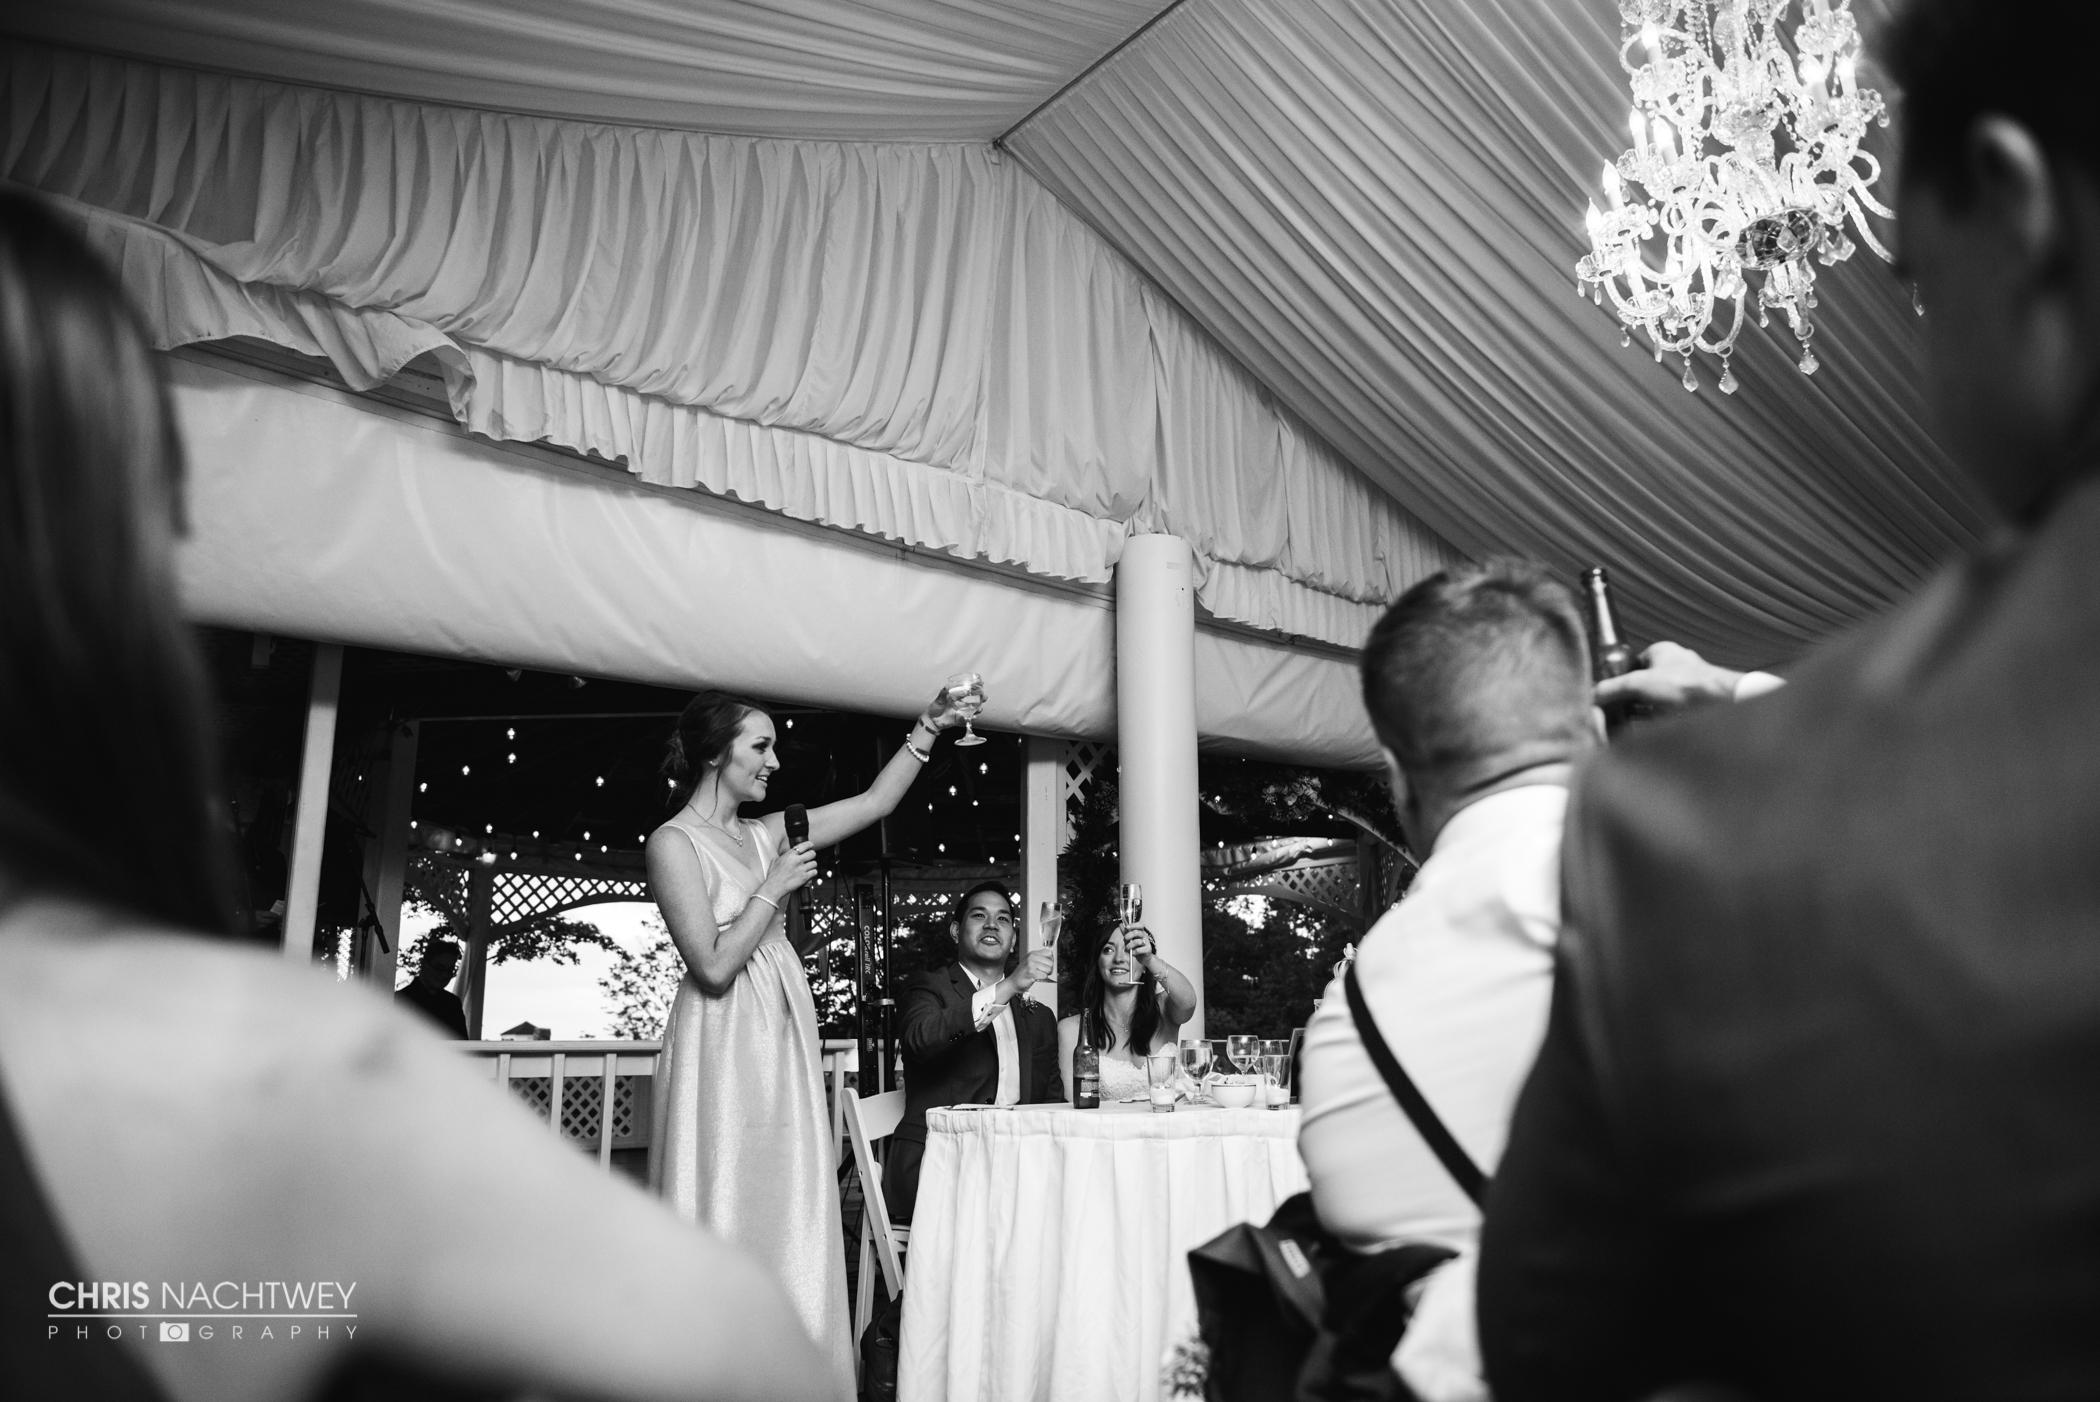 inn-at-mystic-connecticut-wedding-photographer-chris-nachtwey-30.jpg